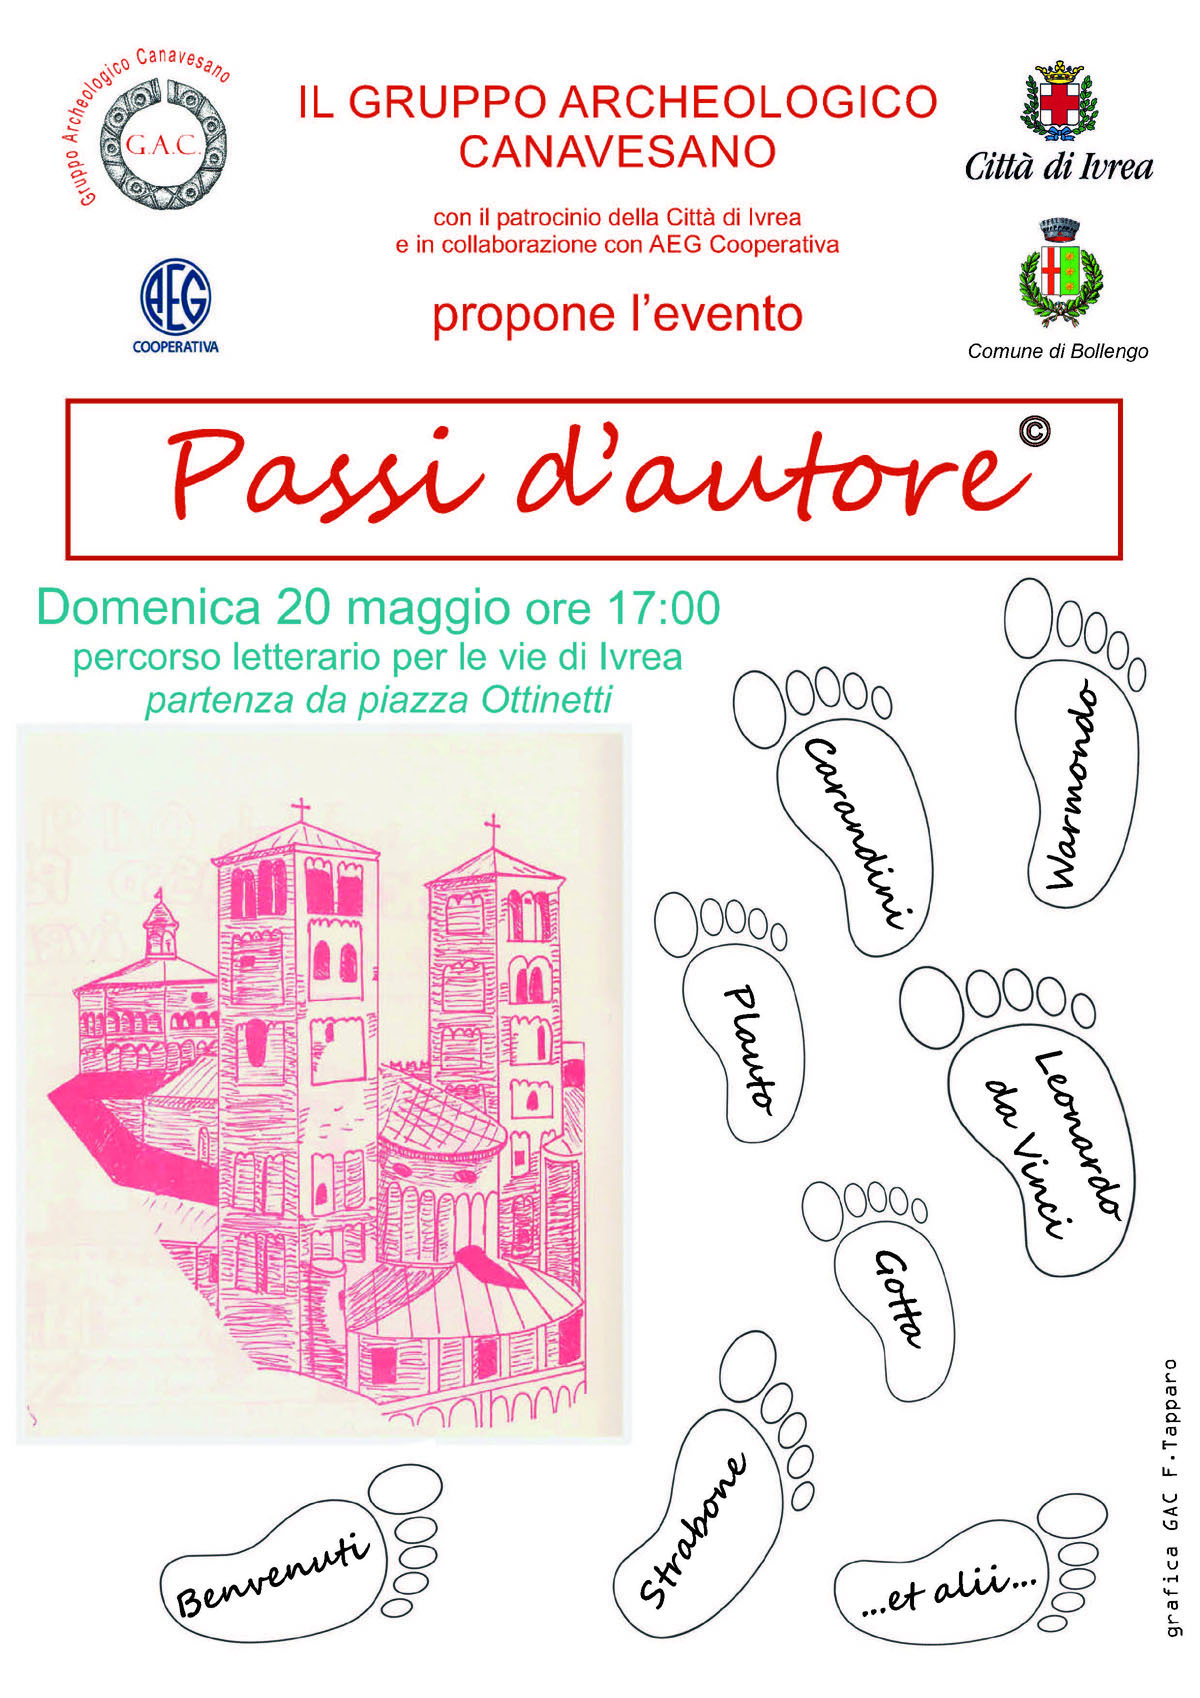 GAC_passi_dautore-1